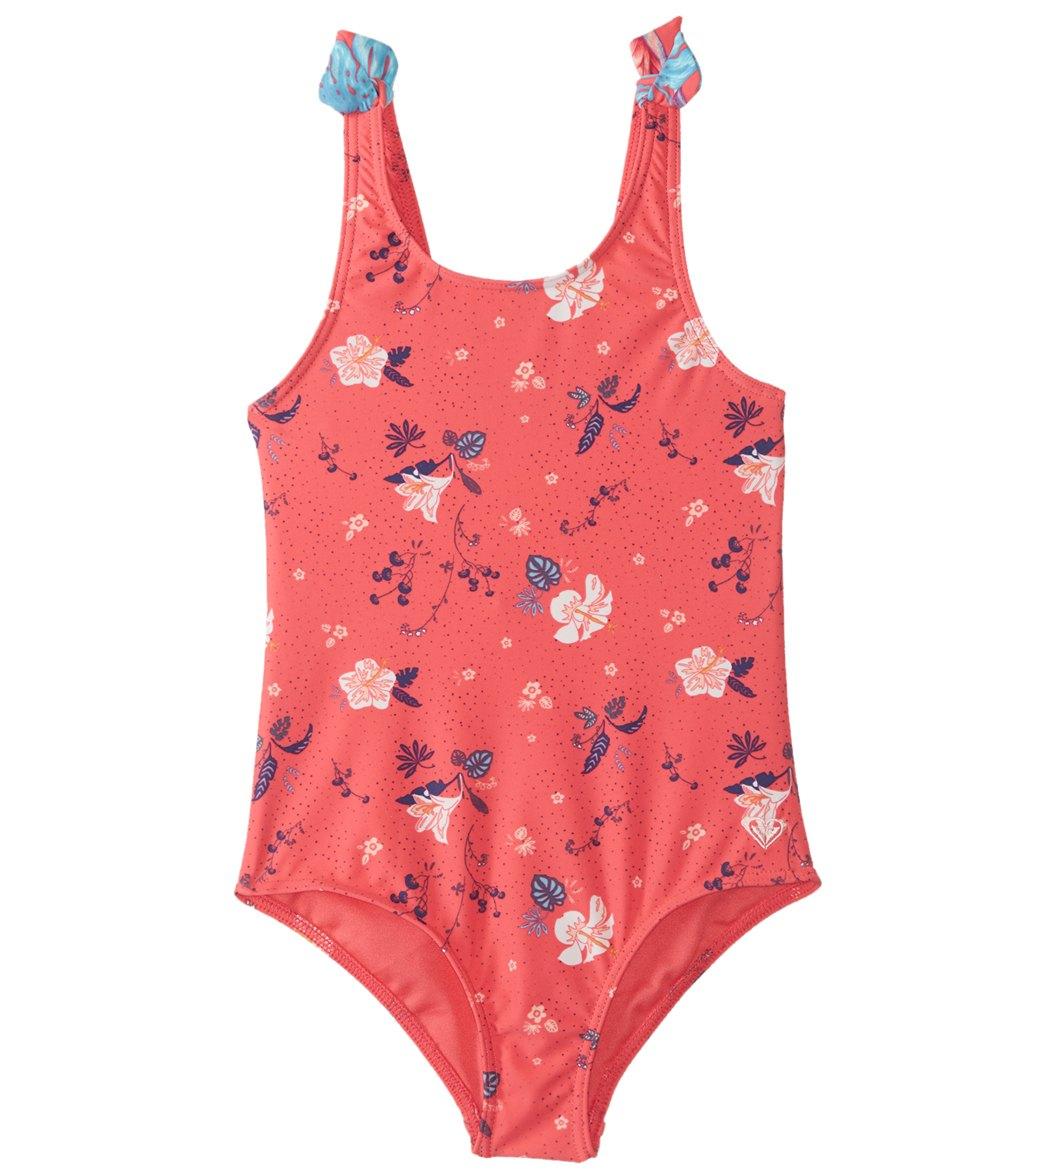 ceadc33362654 Roxy Girls  Mermaid One Piece Swimsuit (Toddler